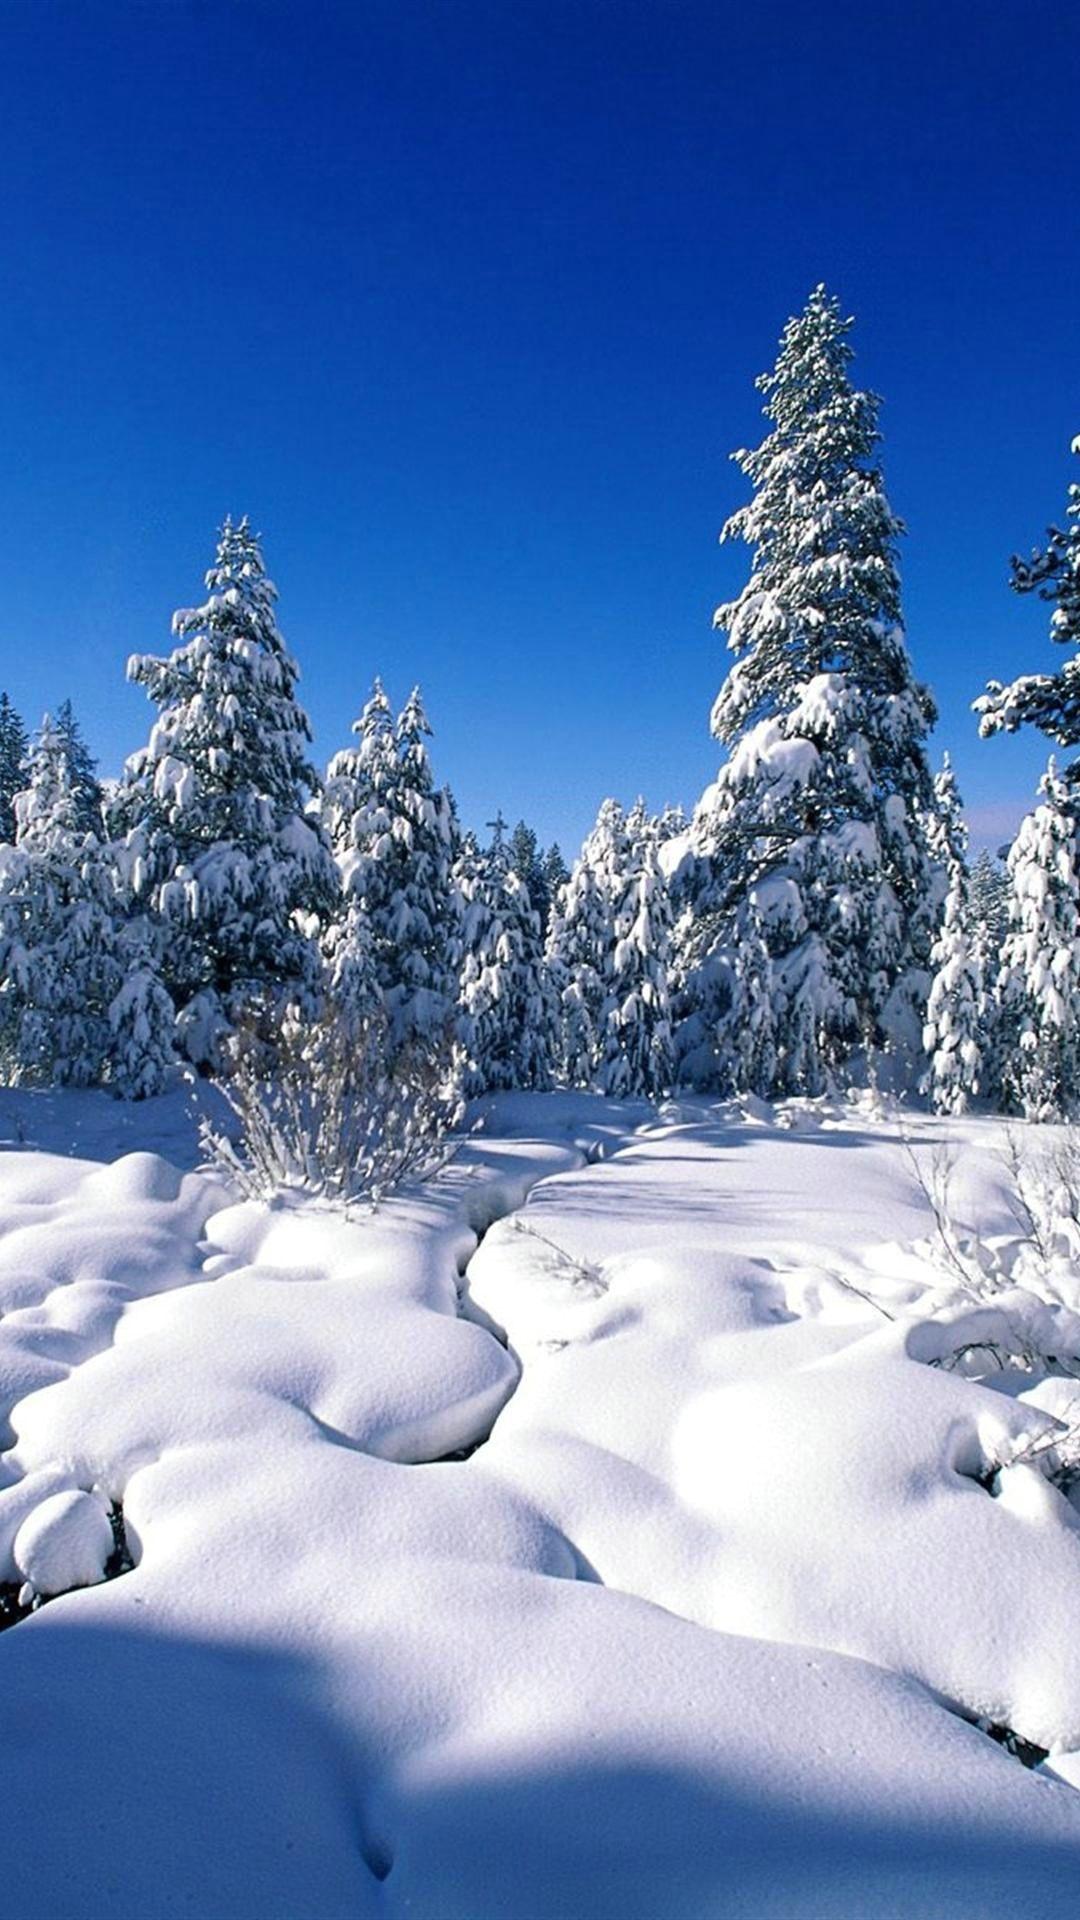 Https All Images Net Wallpaper Iphone Winter 172 Wallpaper Iphone Winter 172 Winter Wallpaper Snow Wallpaper Iphone Winter Background